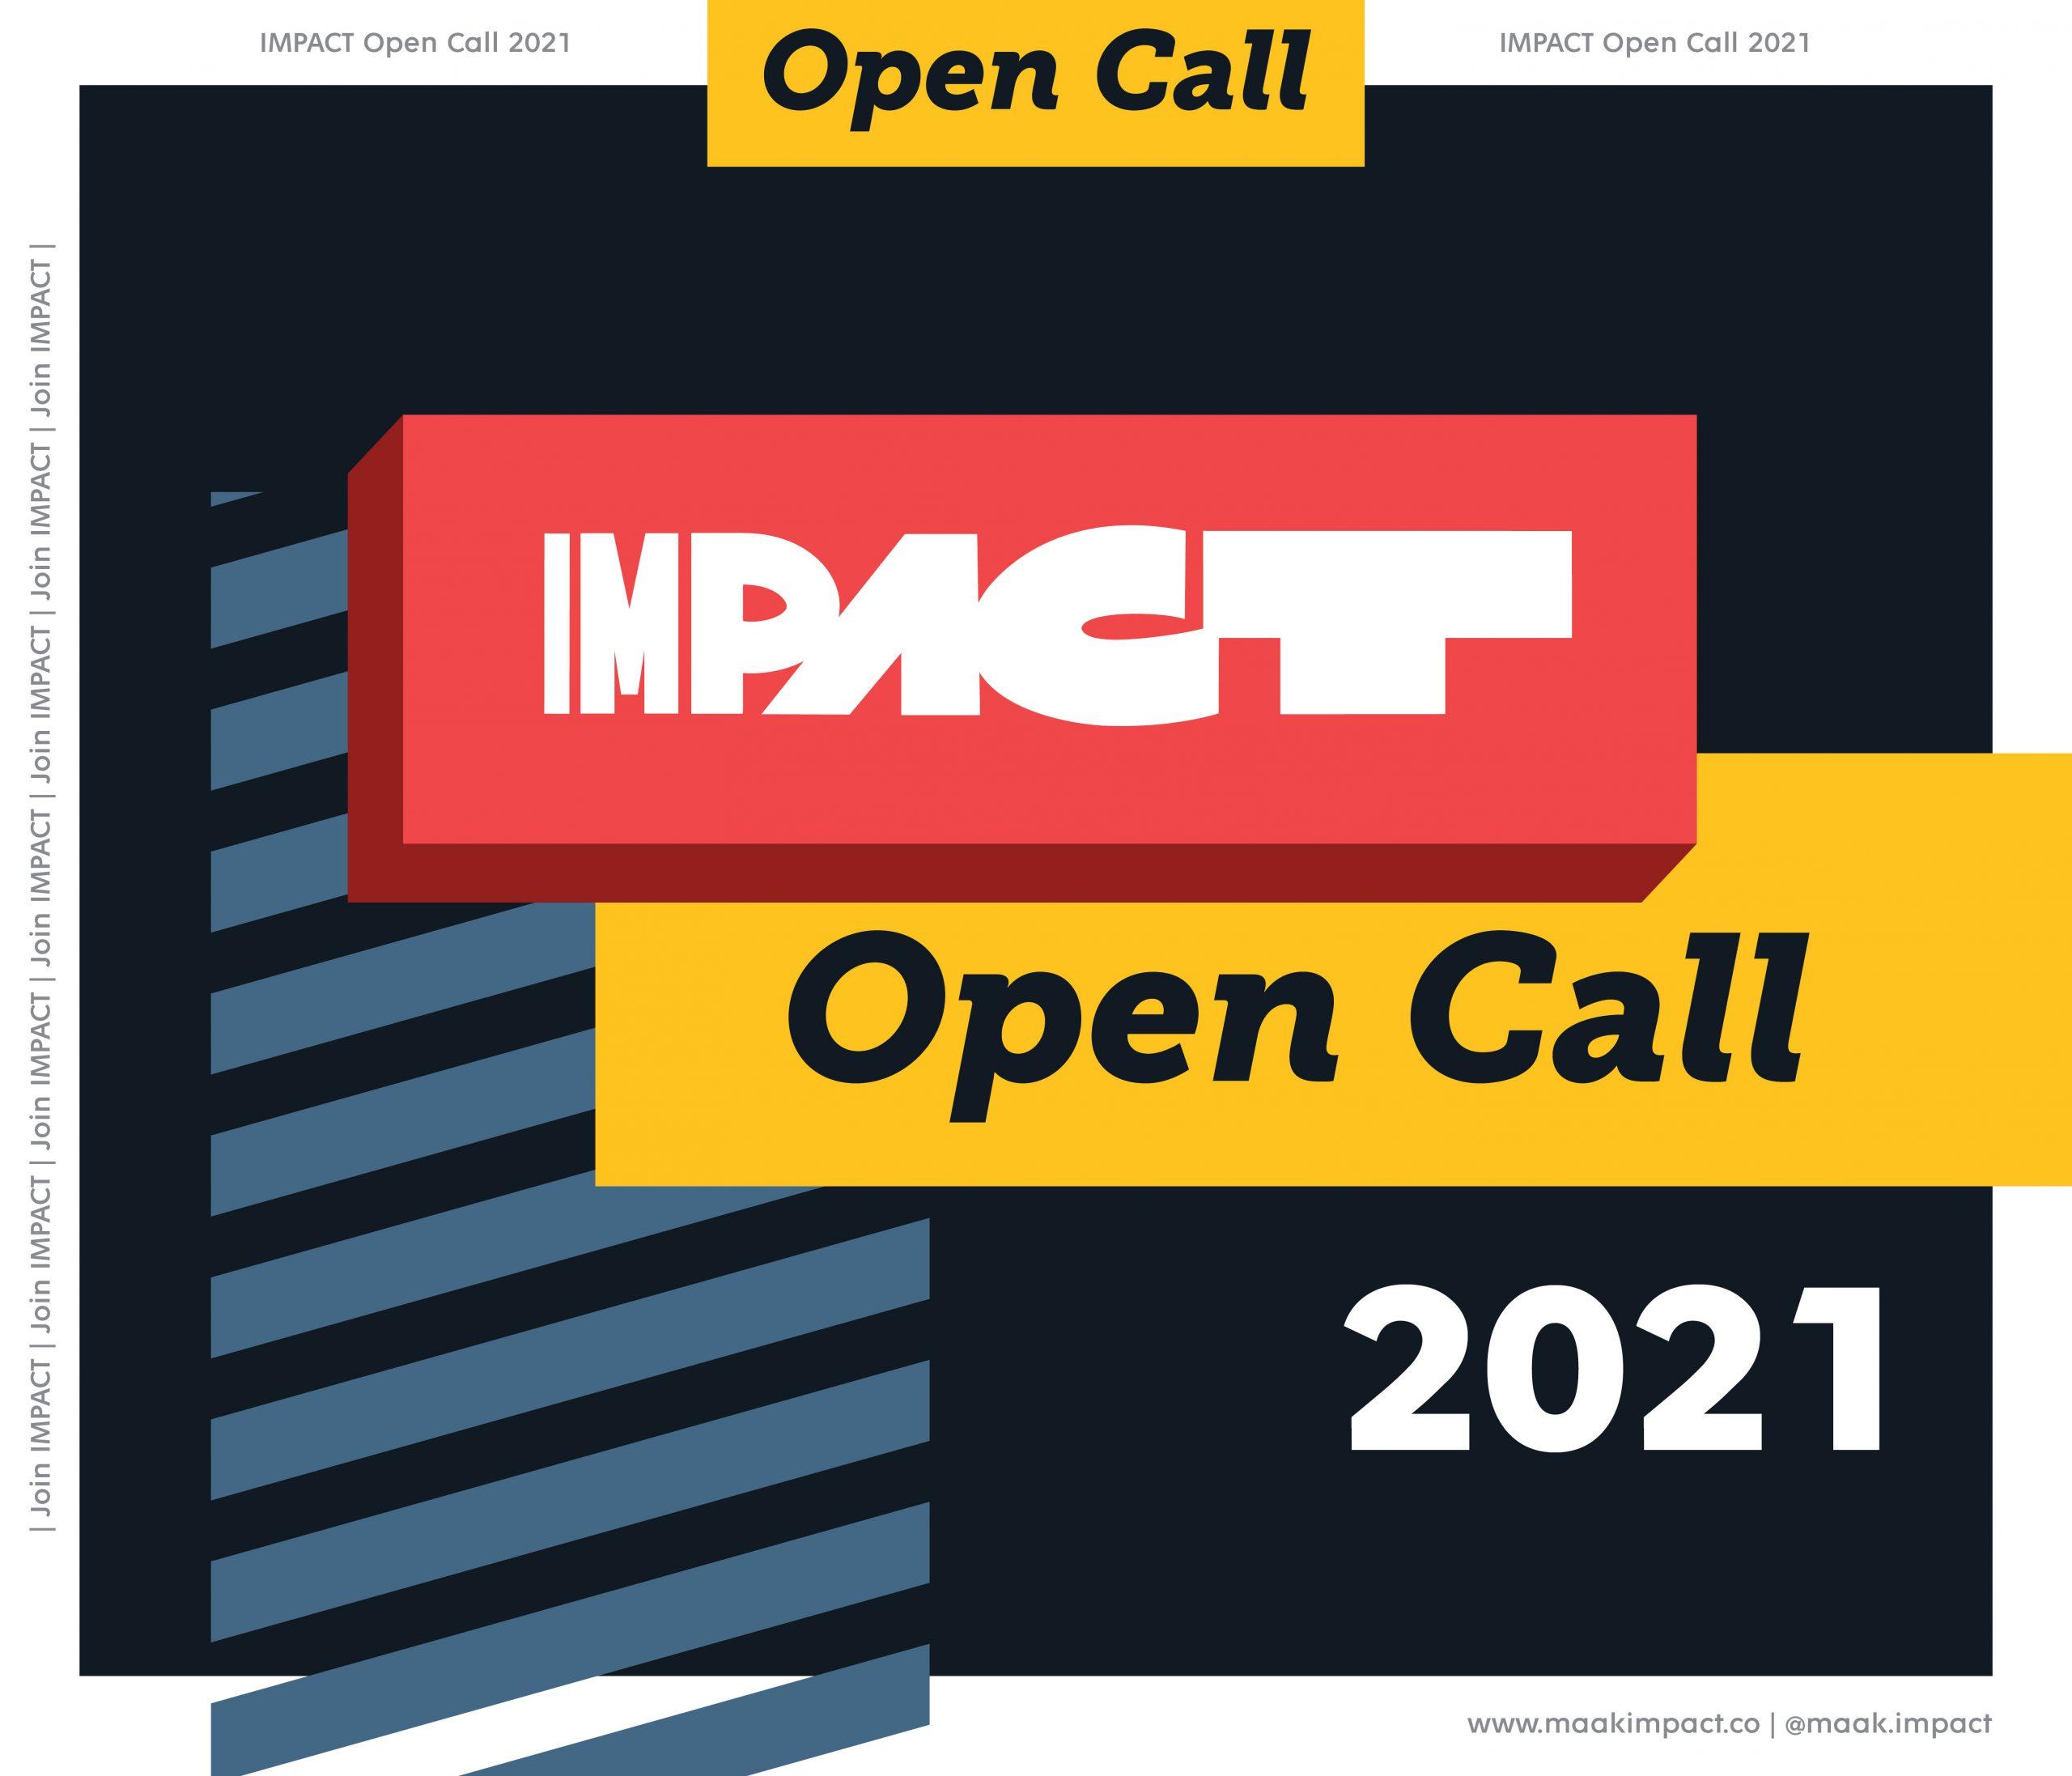 IMPACT Open Call 2021